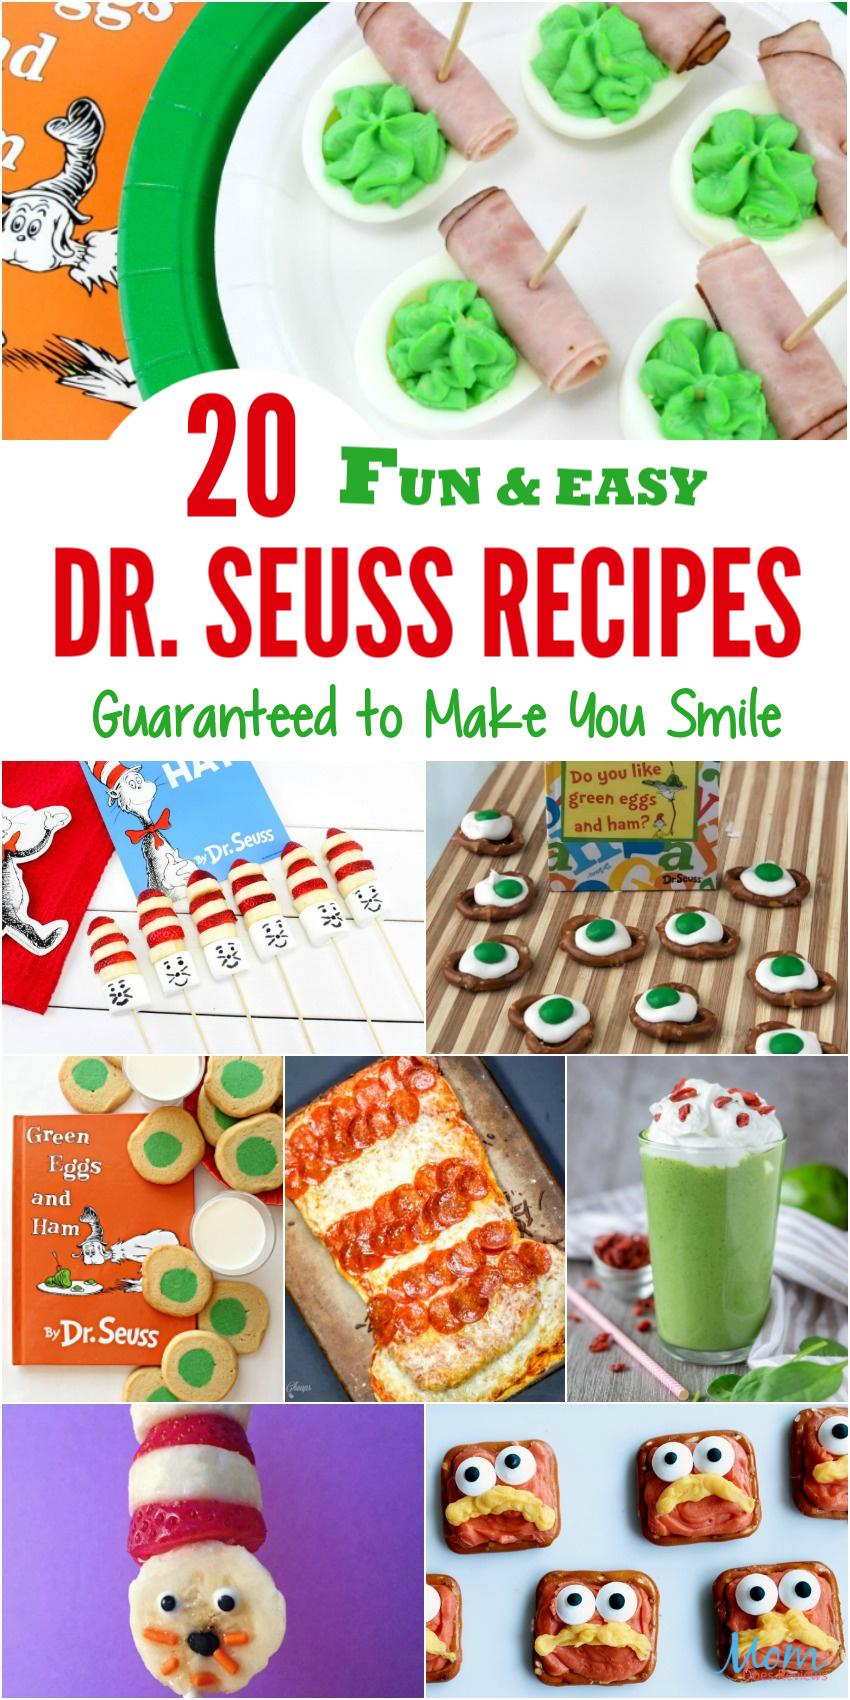 20 Fun & Easy Dr. Seuss Recipes Guaranteed to Make You Smile #drseuss #funfood #recipes